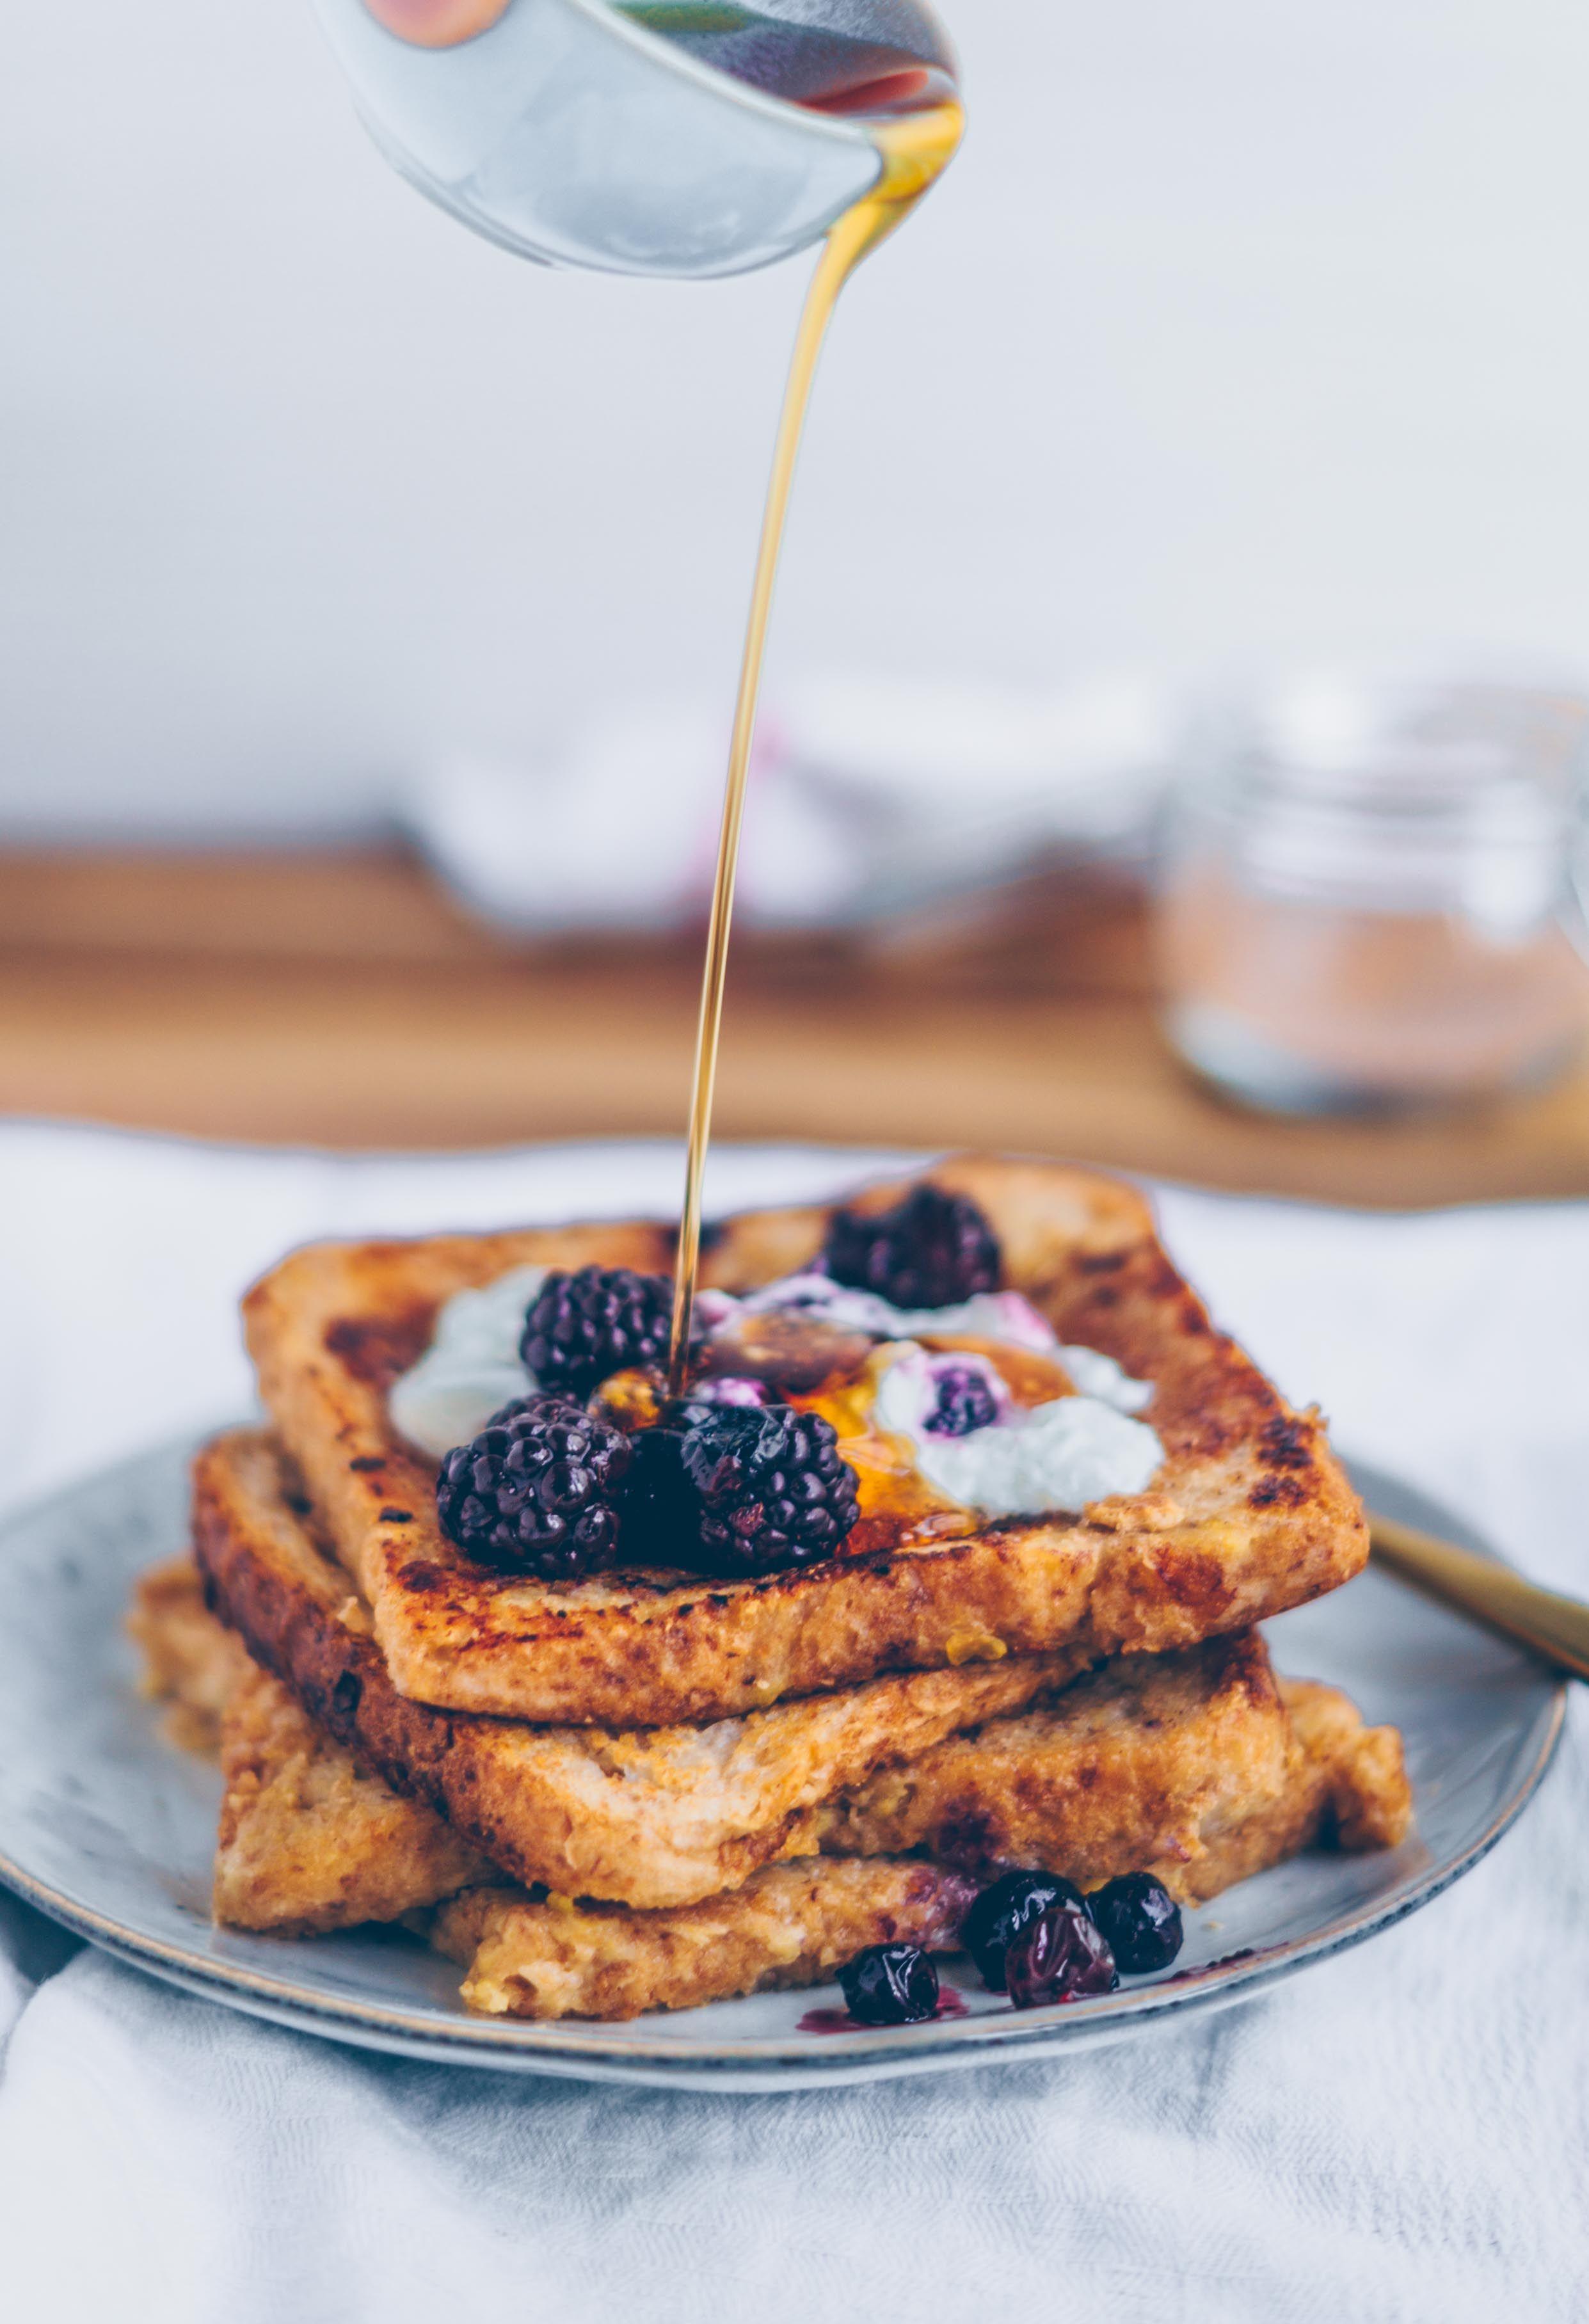 Easy Vegan French Toast Mit Beeren Kompott Rezept Lebensmittel Essen Fruhstucksideen Und Lebensmittelwerbung